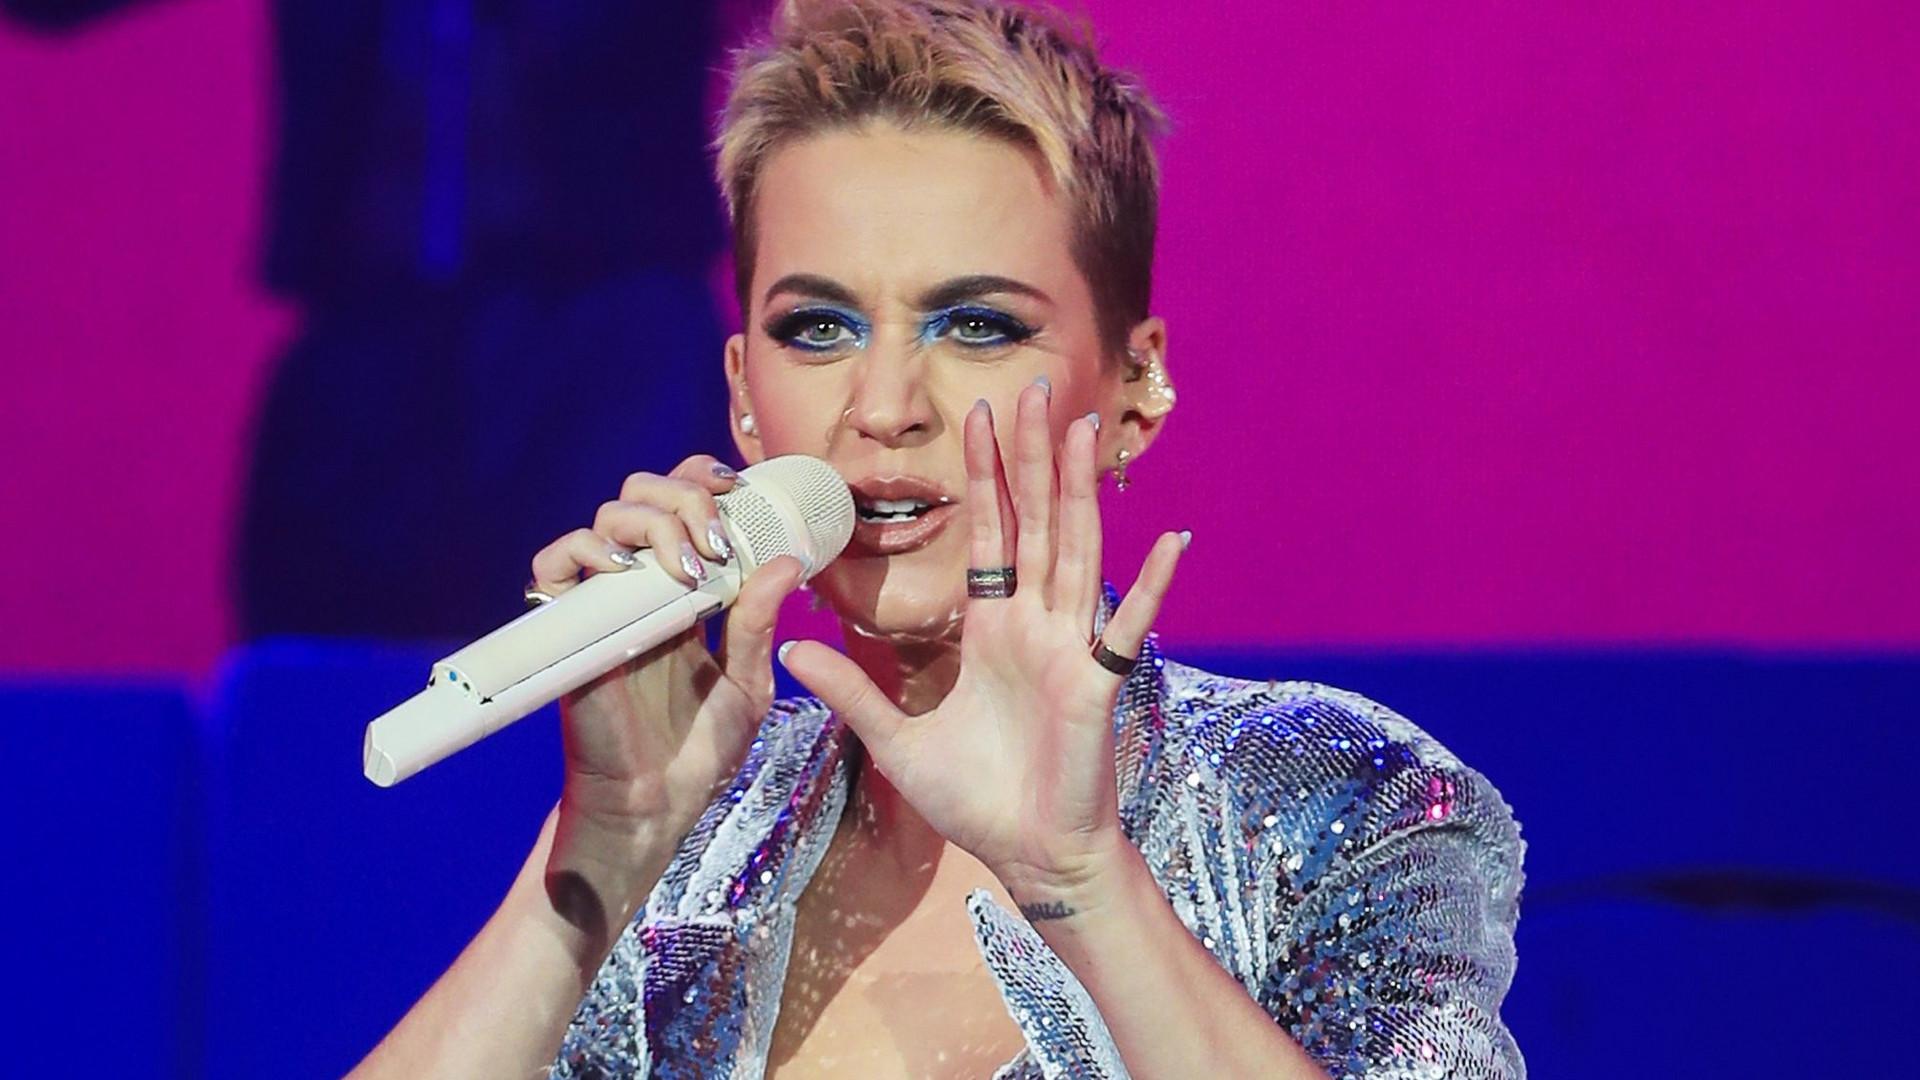 Stars                   #MeToo Katy Perry wird sexuelle Belästigung vorgeworfen                                             13.0